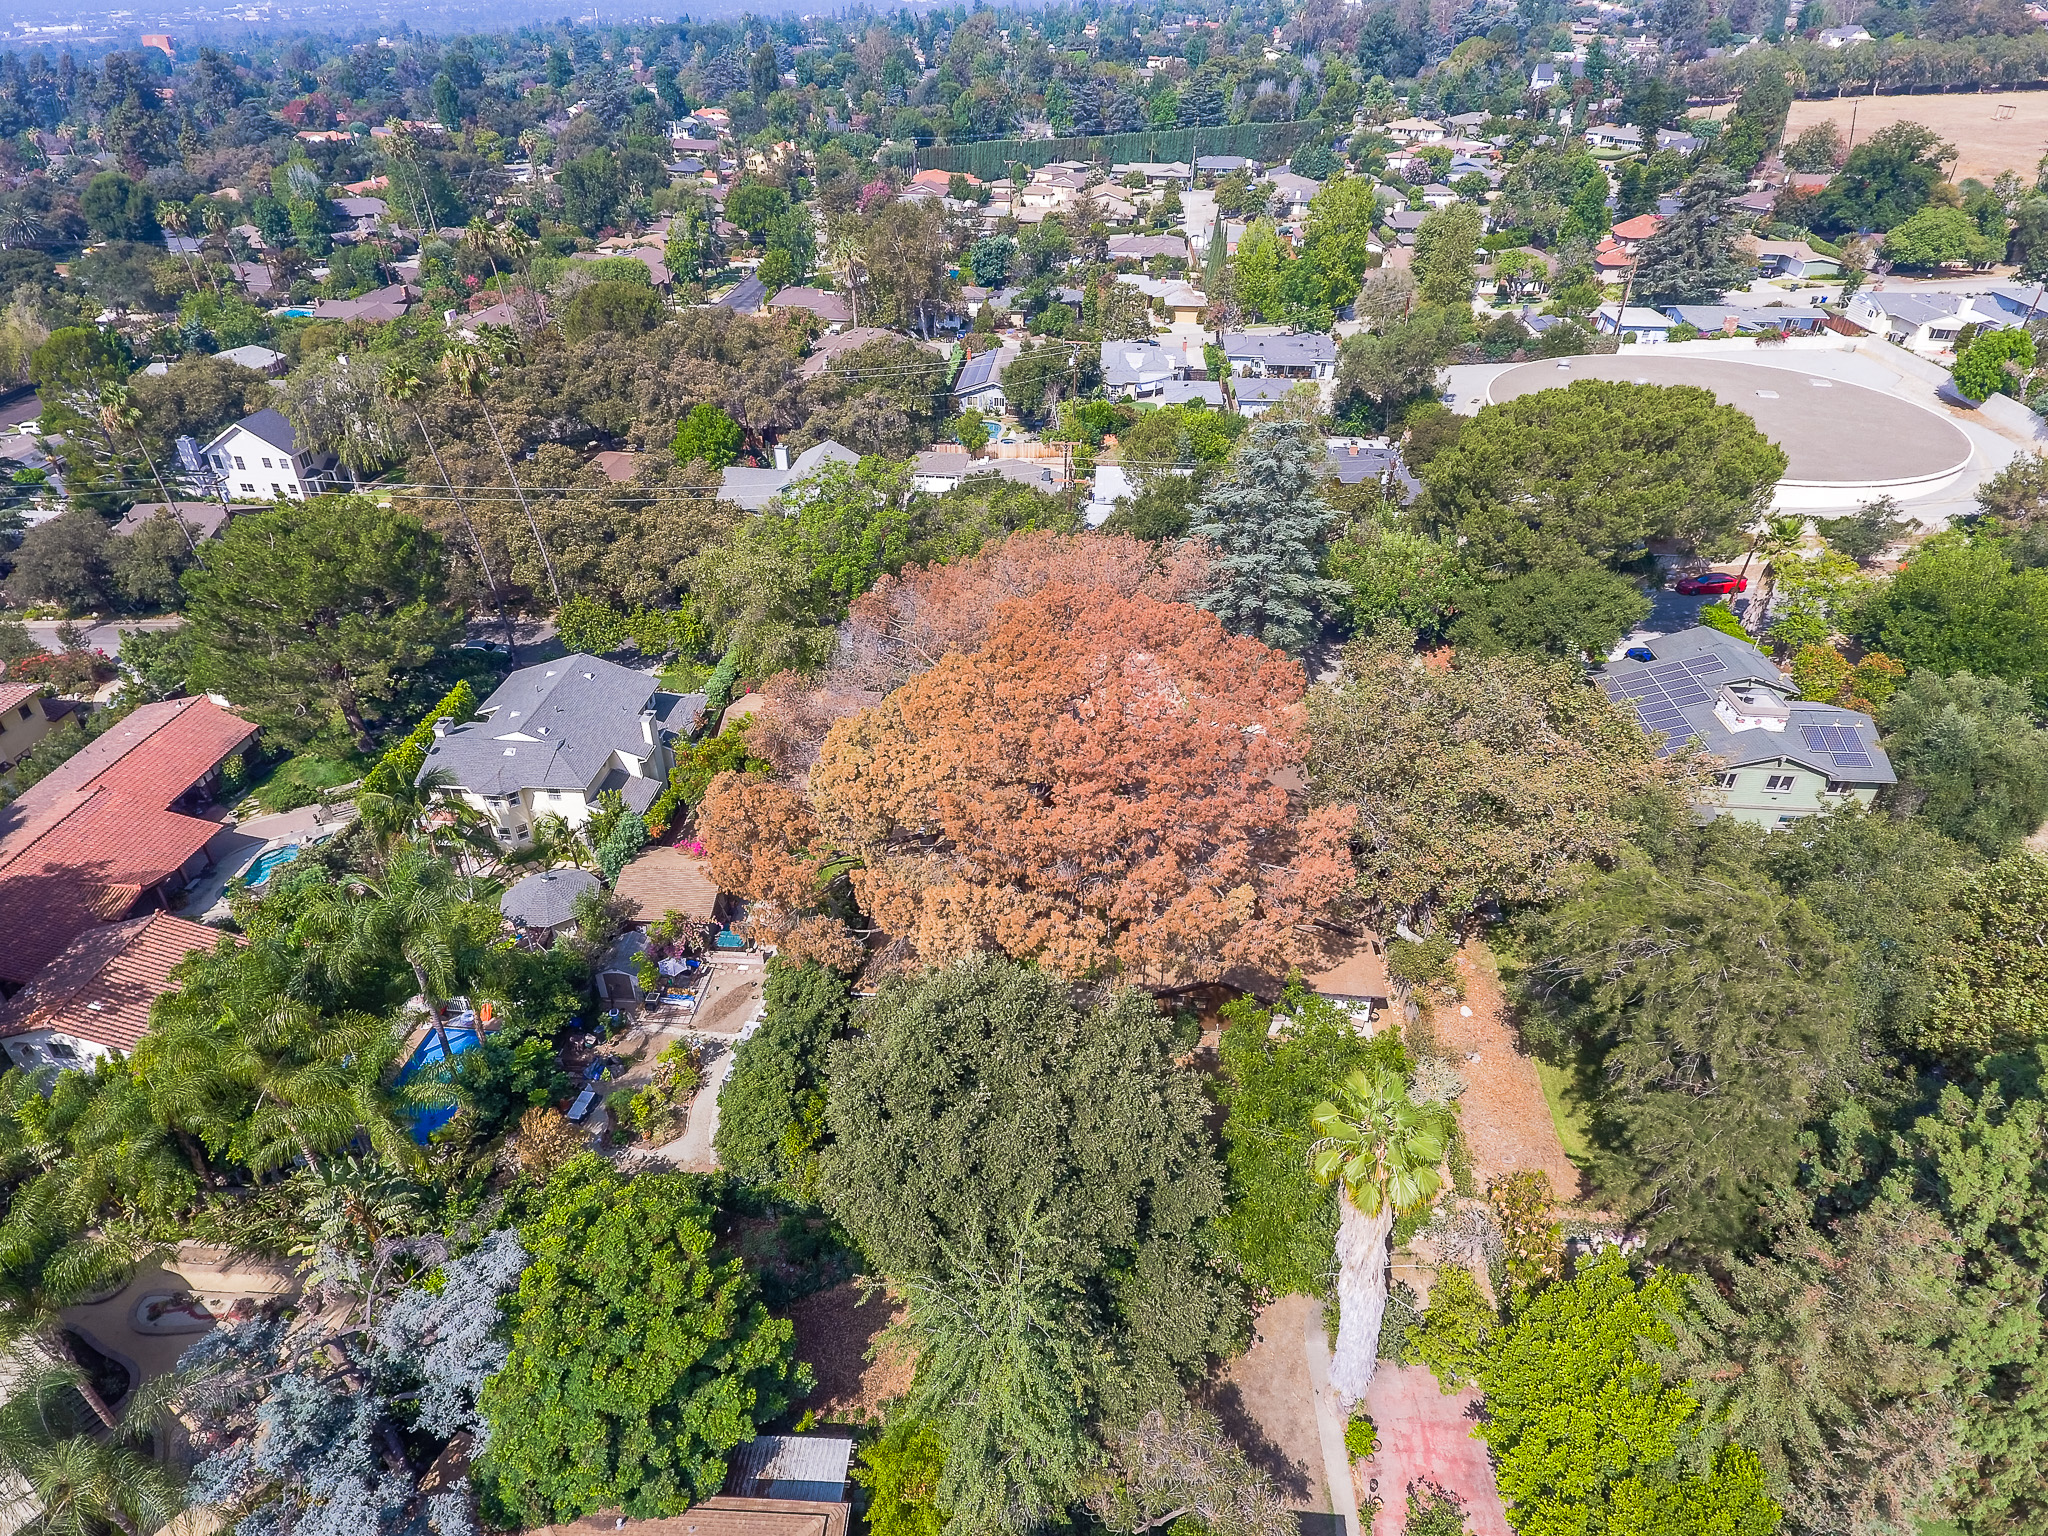 Mariposa Tree Removal Aerial 2-13.jpg